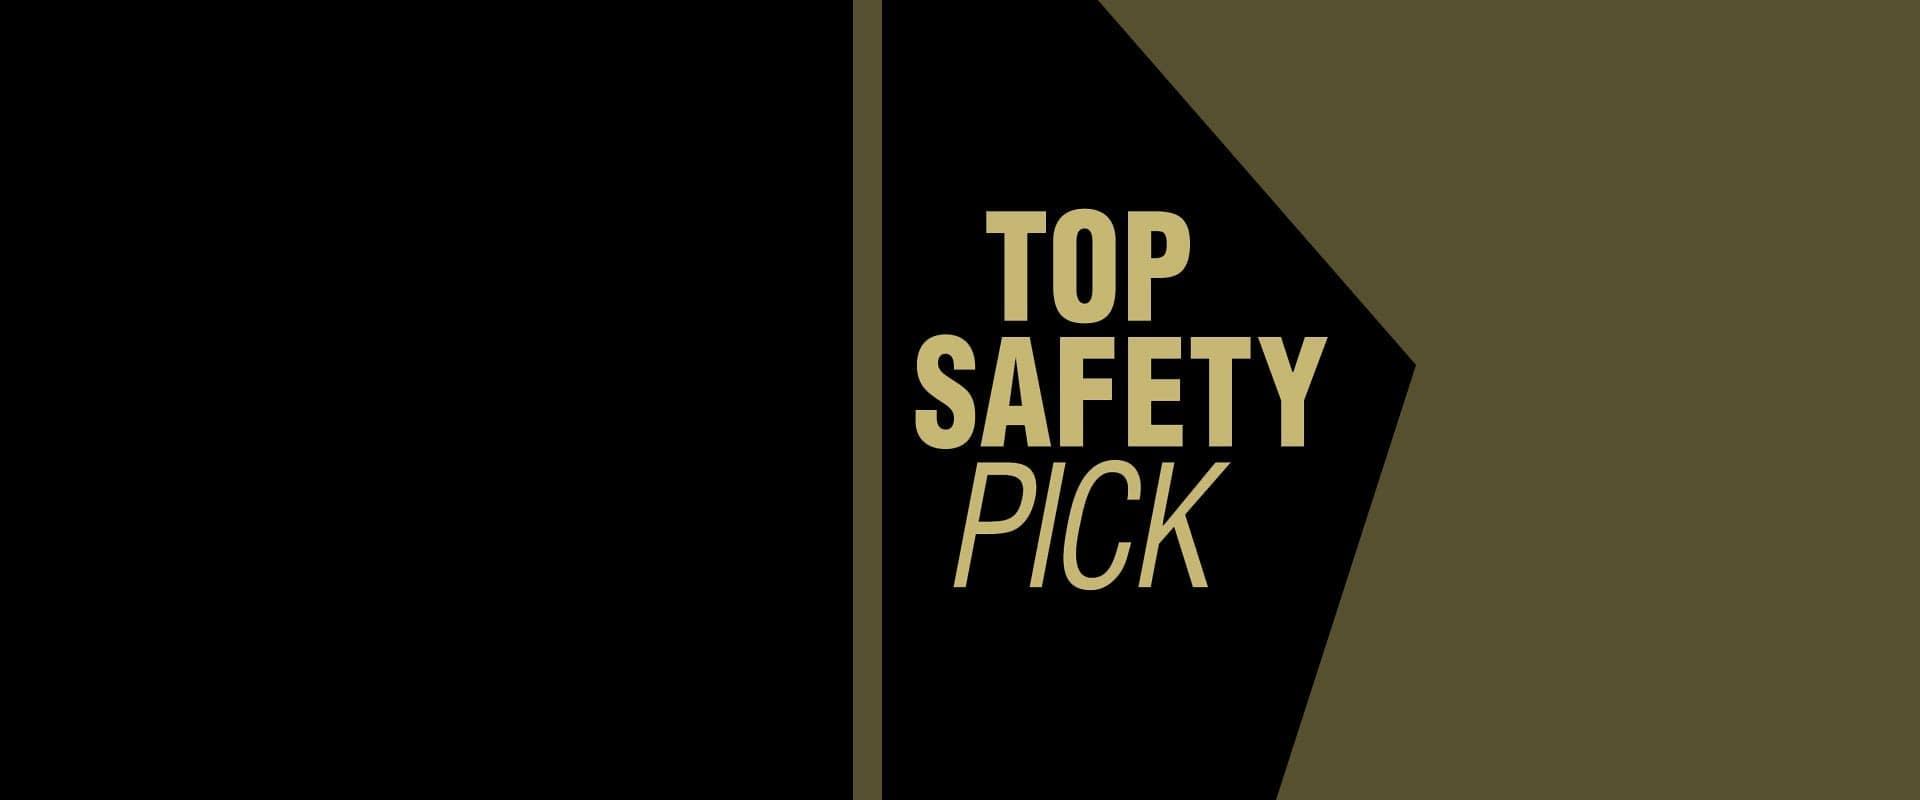 2020 INFINITI QX60 IIHS Top Safety Pick